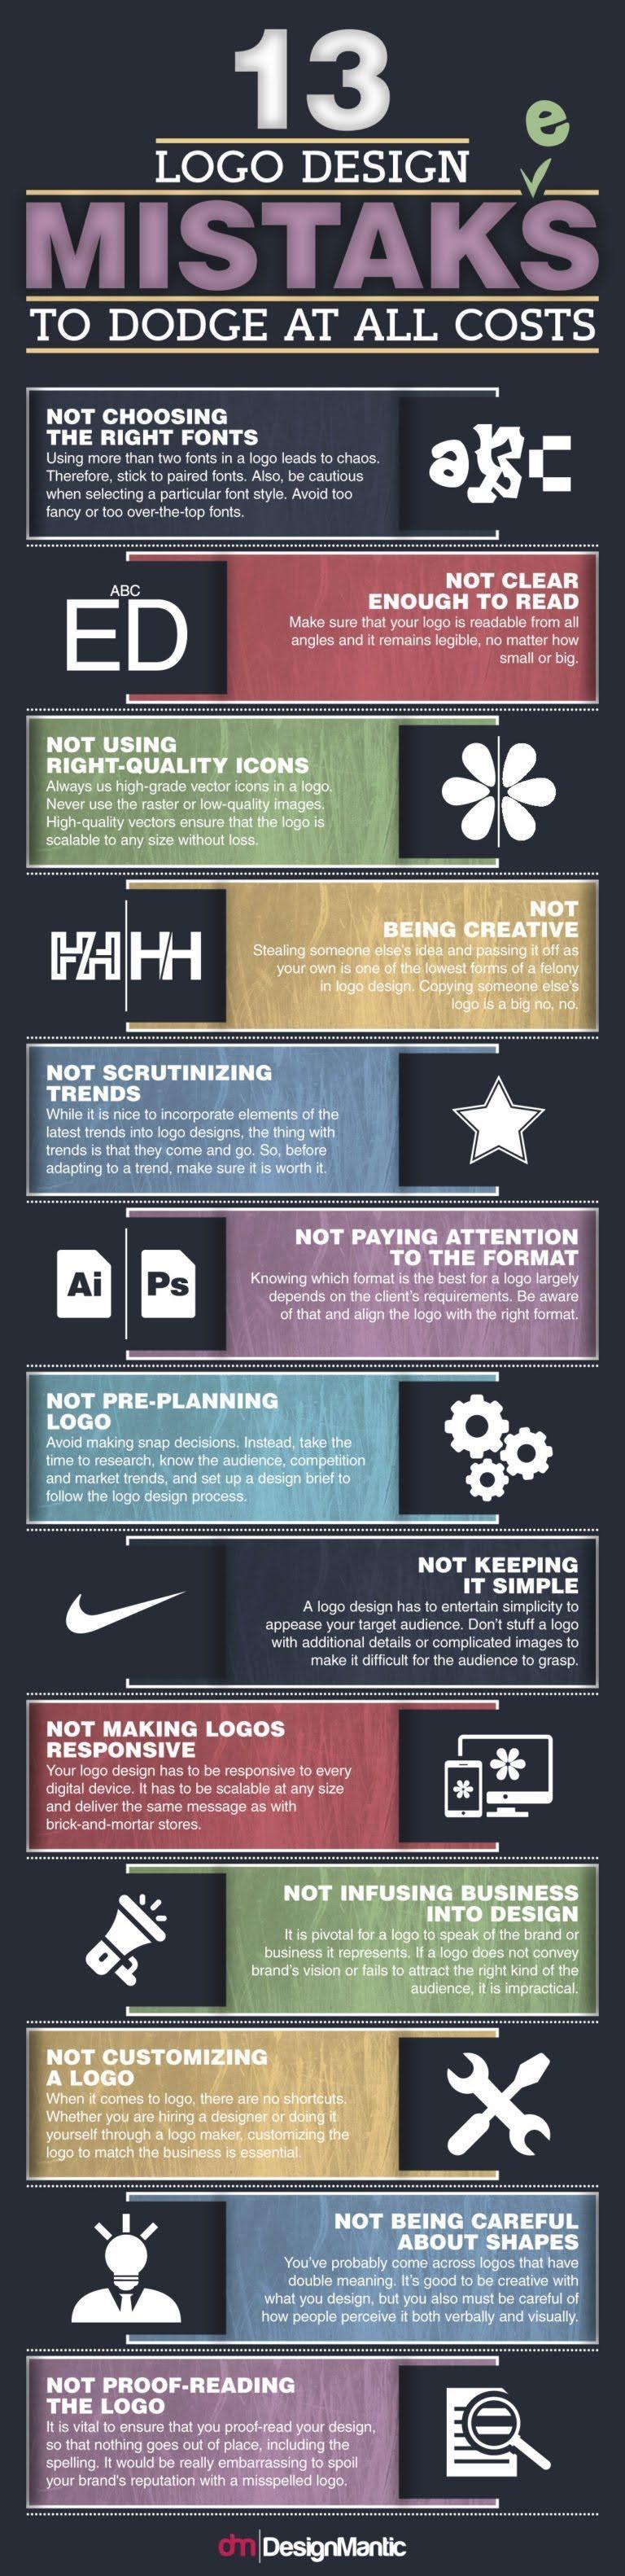 Design Mistakes info